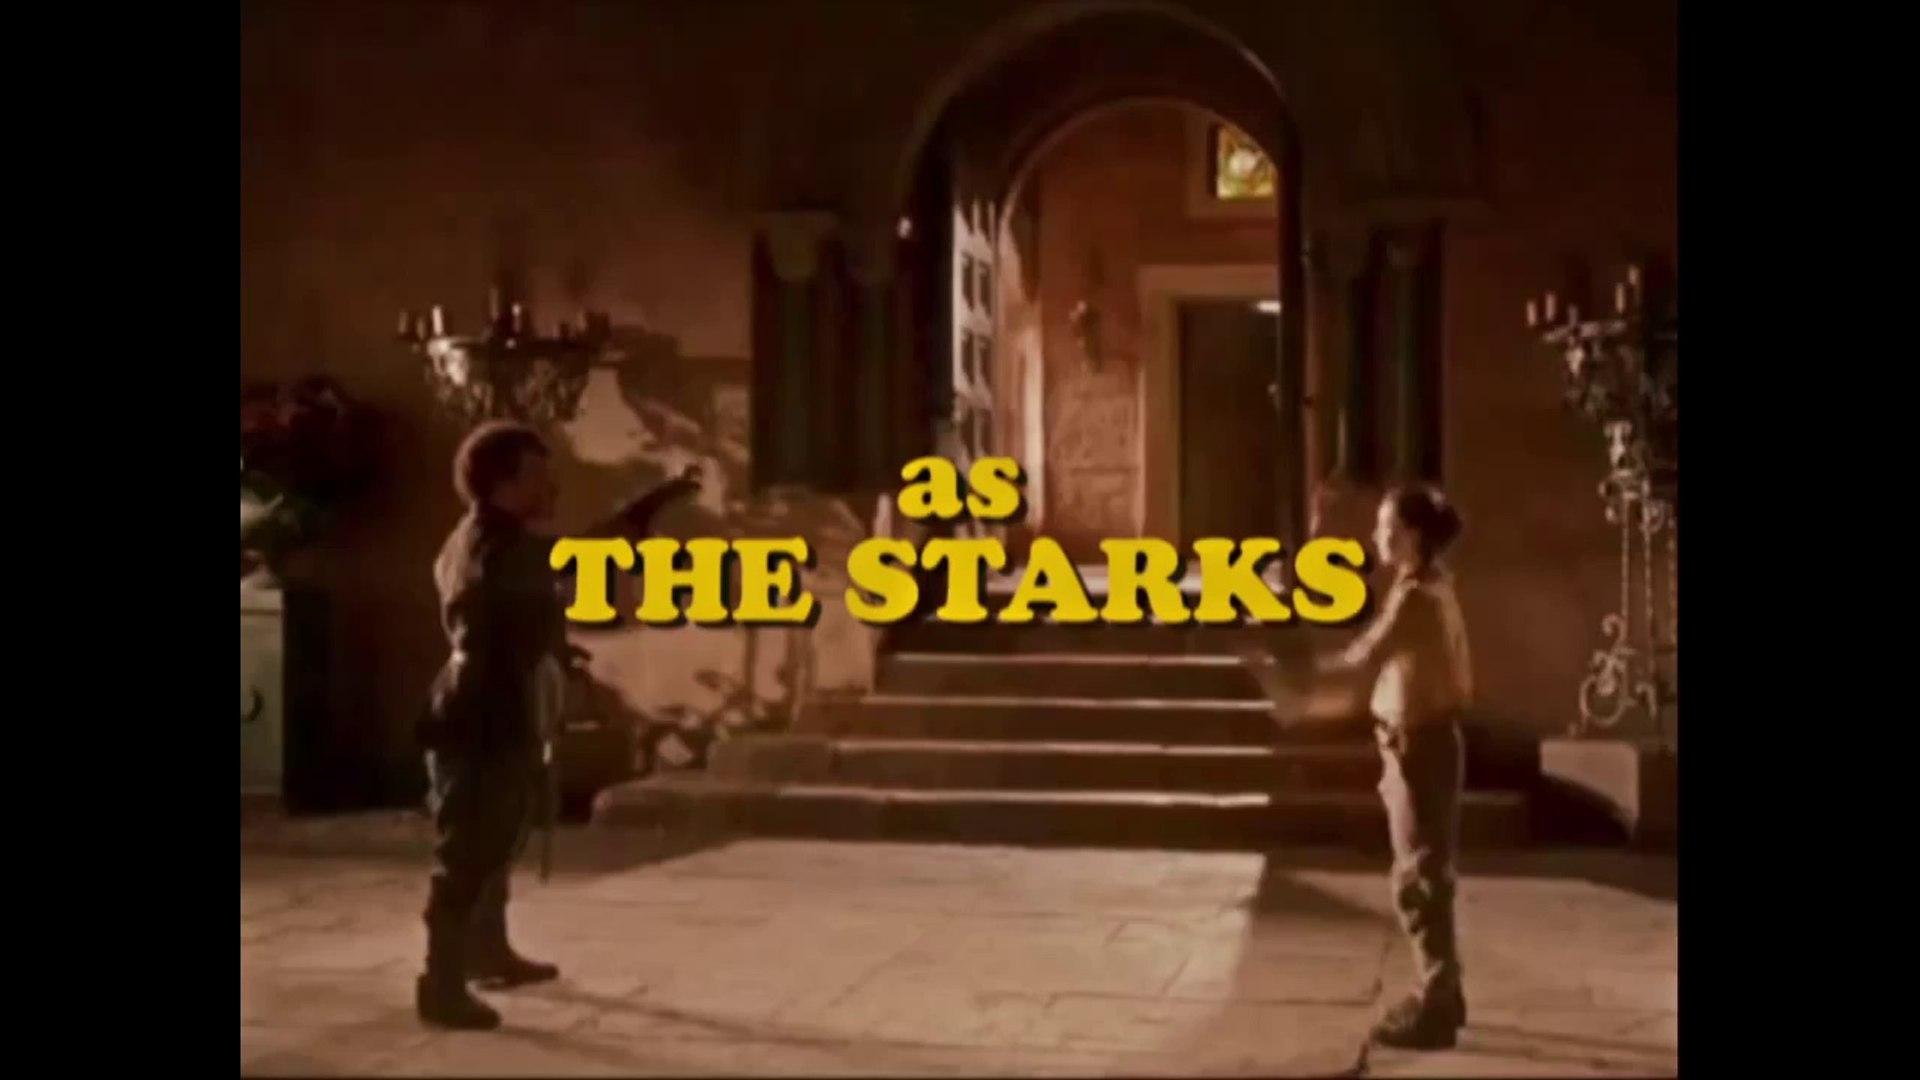 Game Of Thrones Parodies: GoT Sitcom